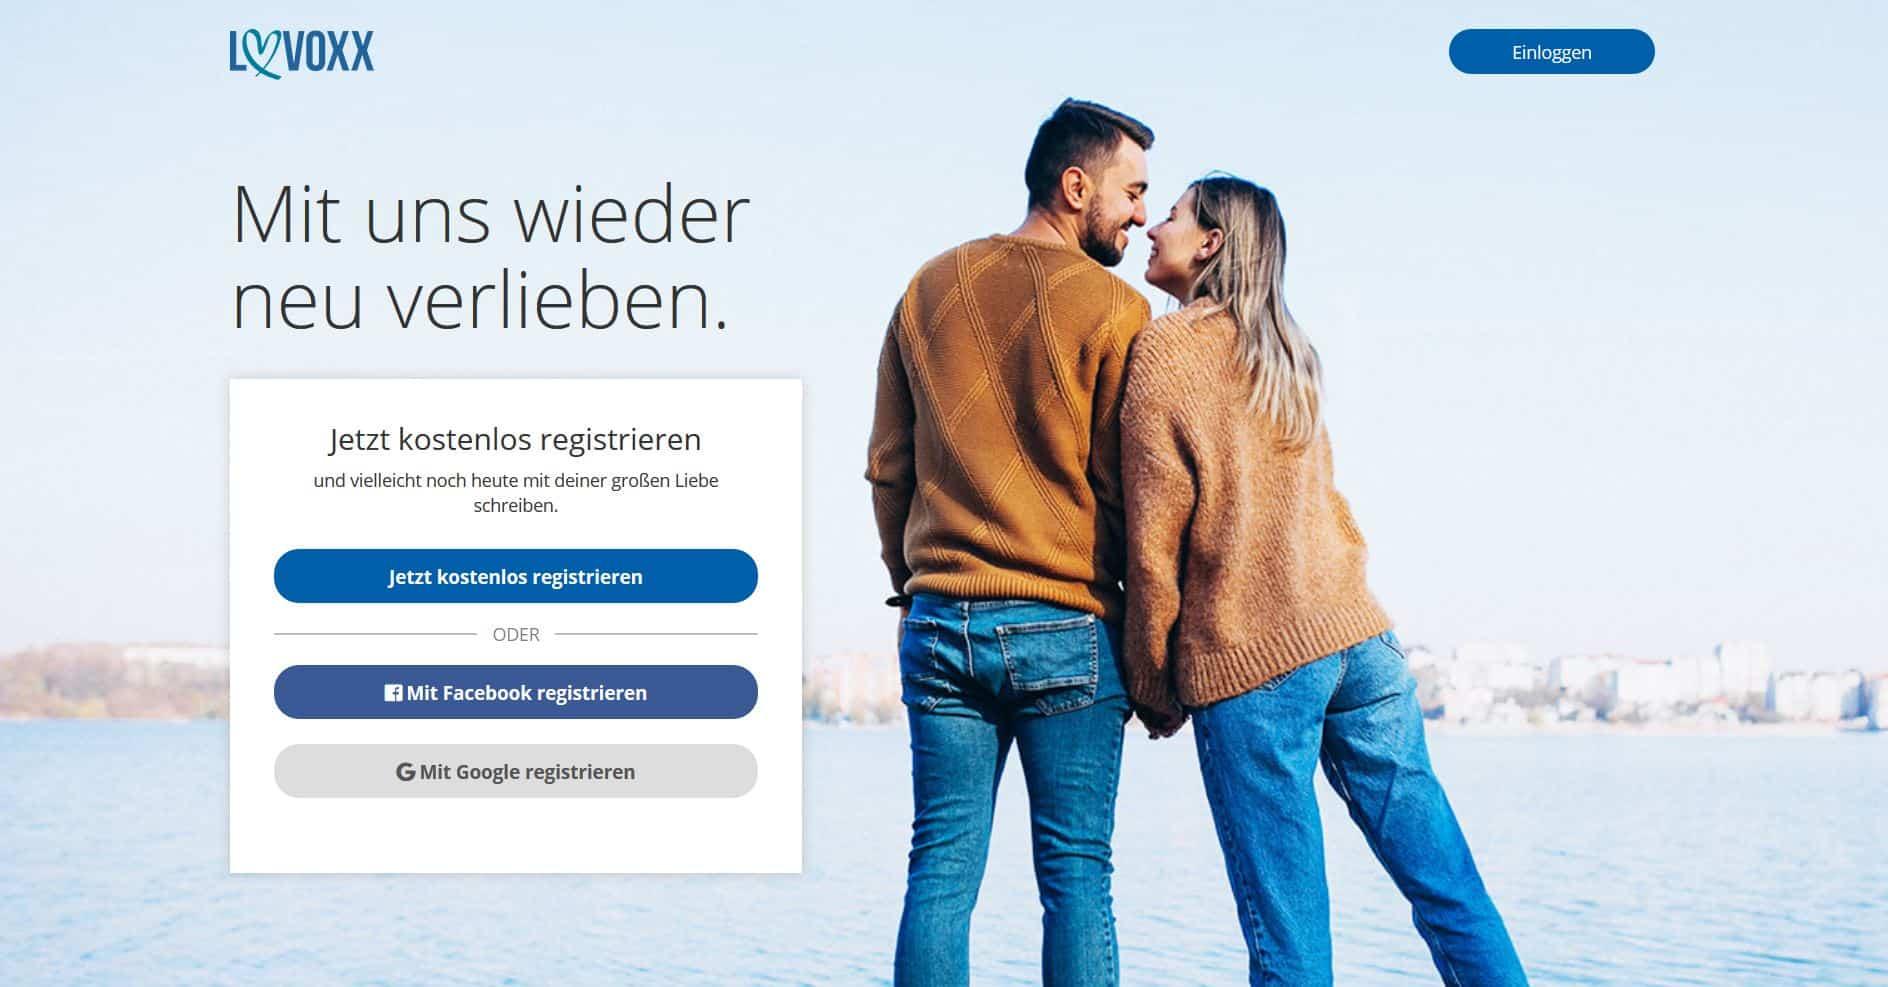 Testbericht - lovoxx.de Abzocke